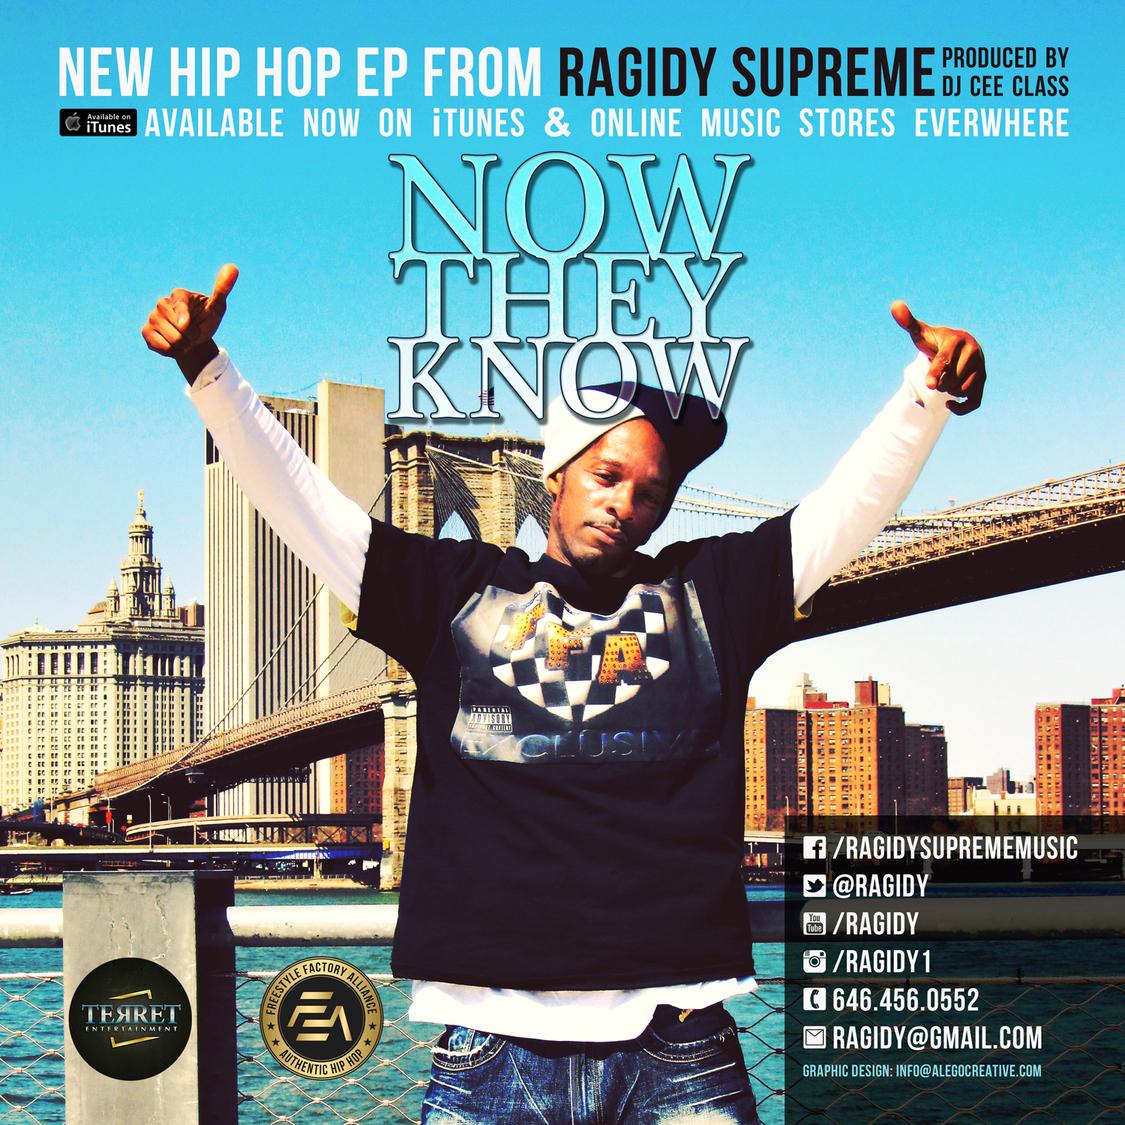 Ragidy Supreme - Supremacy In Stereo